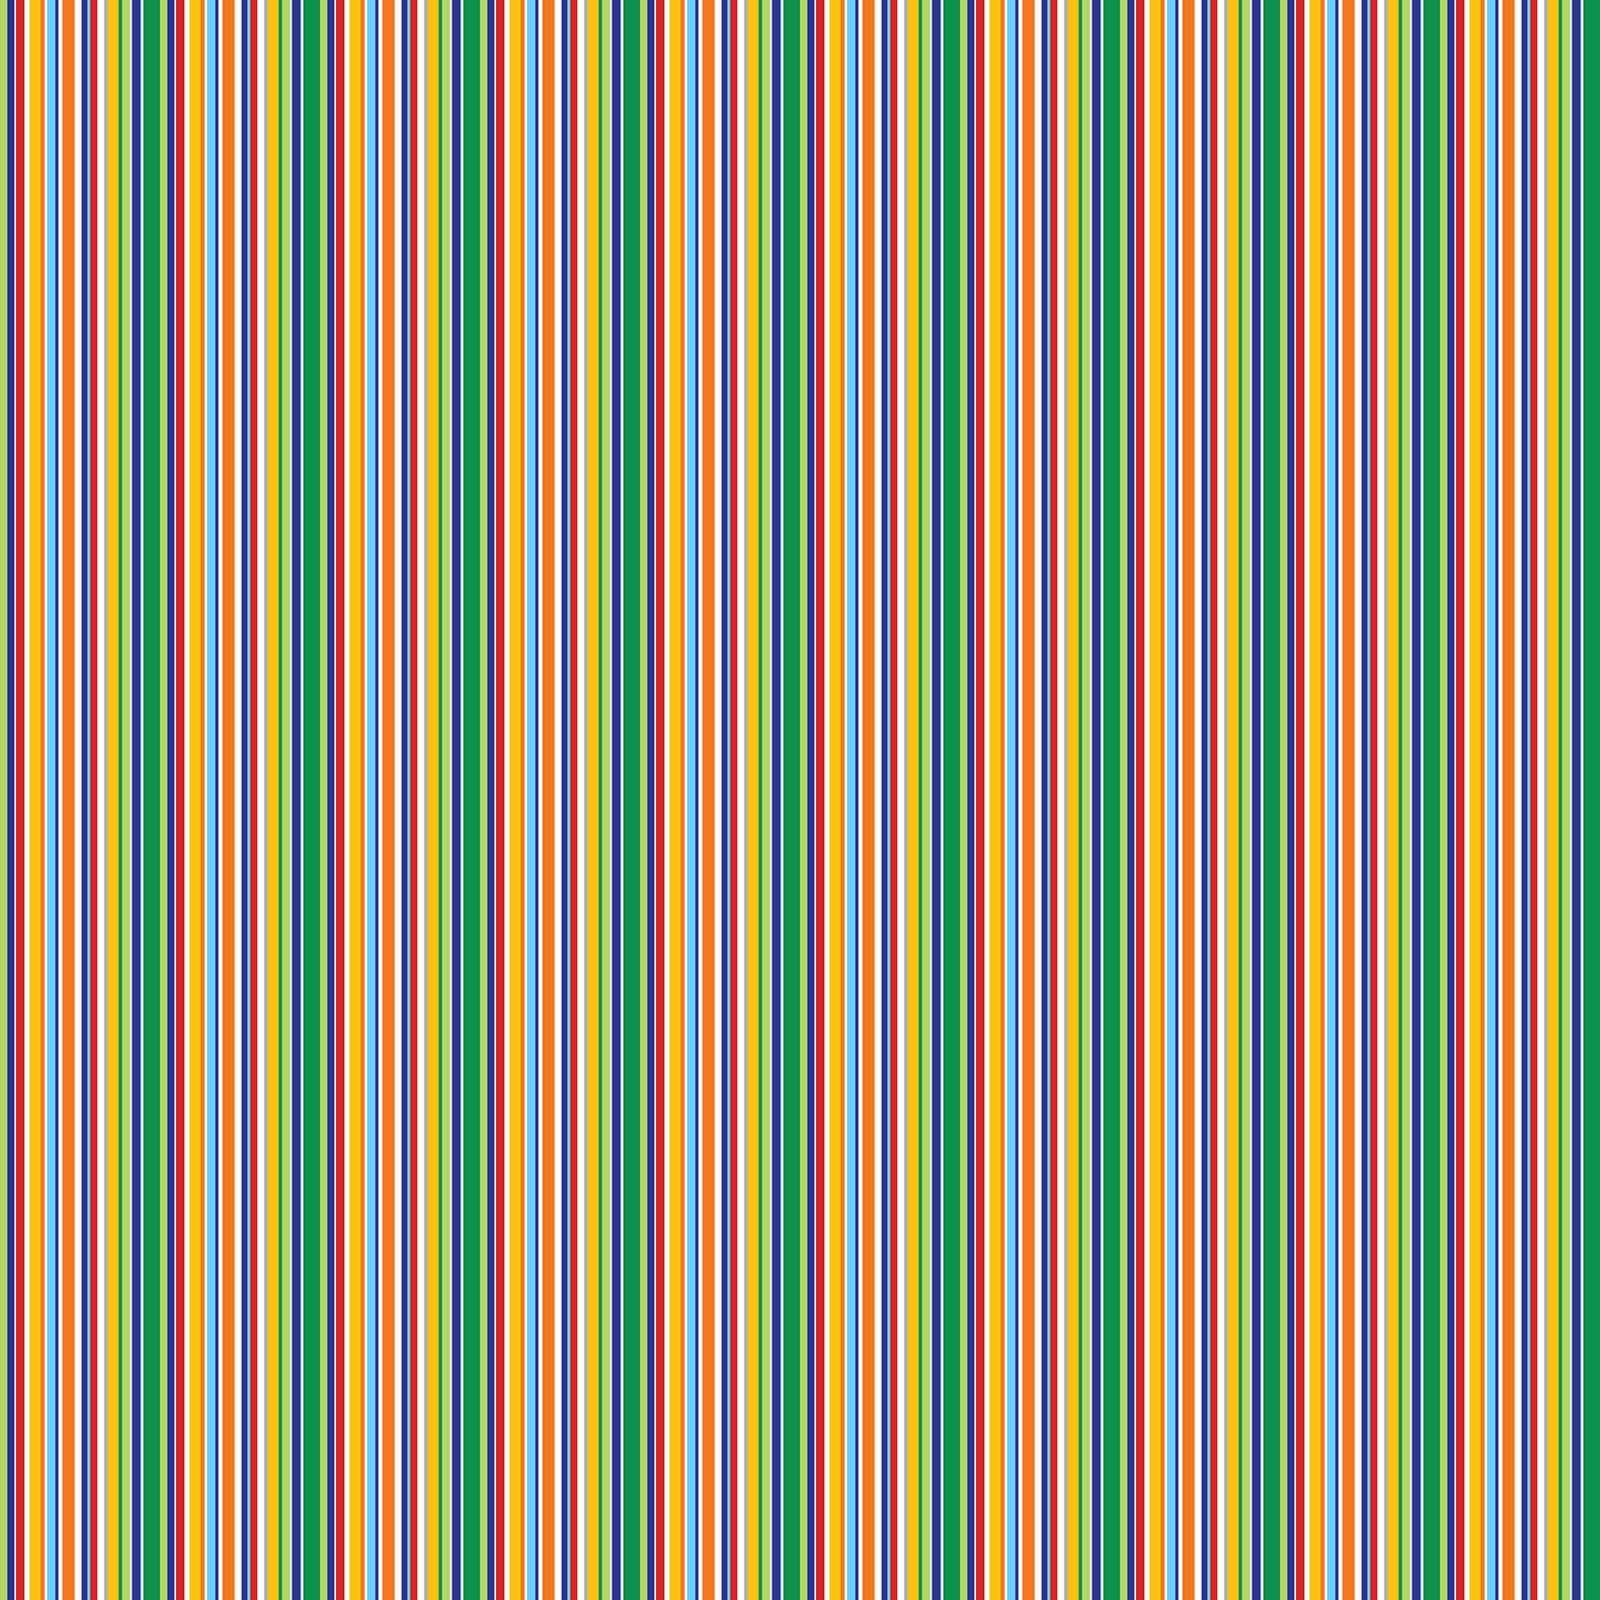 All Around Town Barcode Stripe